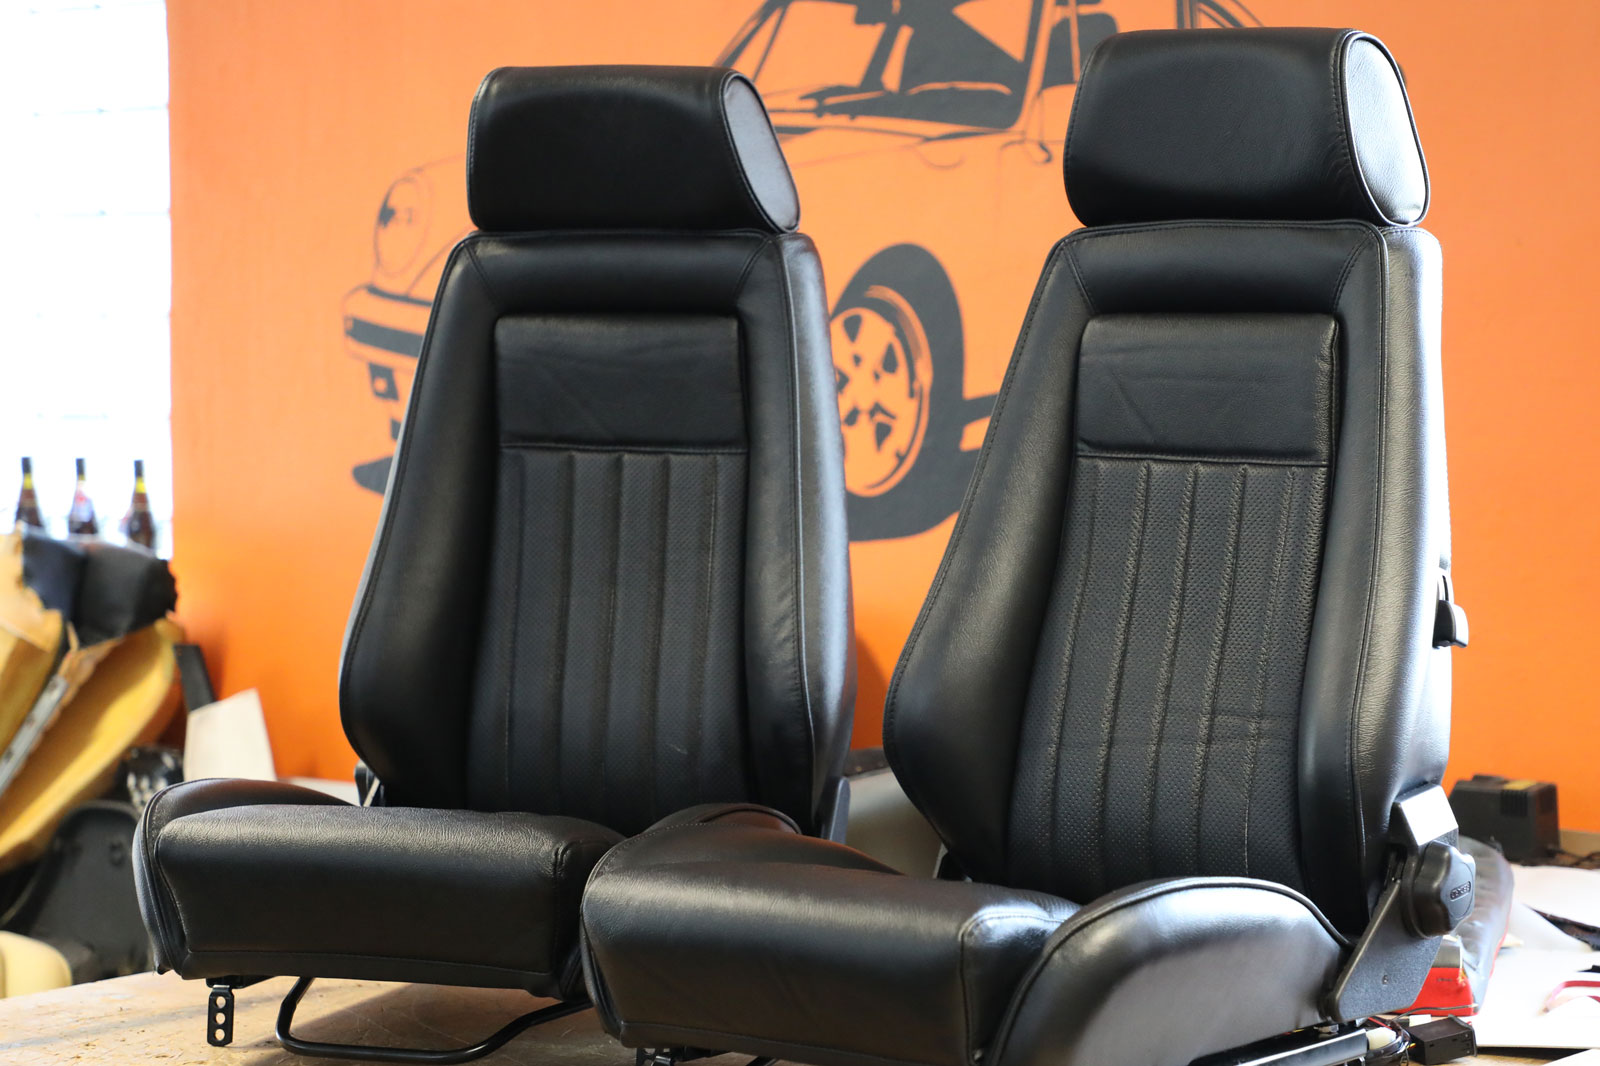 Sattlerei K.M. Lederdesign, Polsterer, Recaro Sitze vorn Sattlerei Autositze beziehen